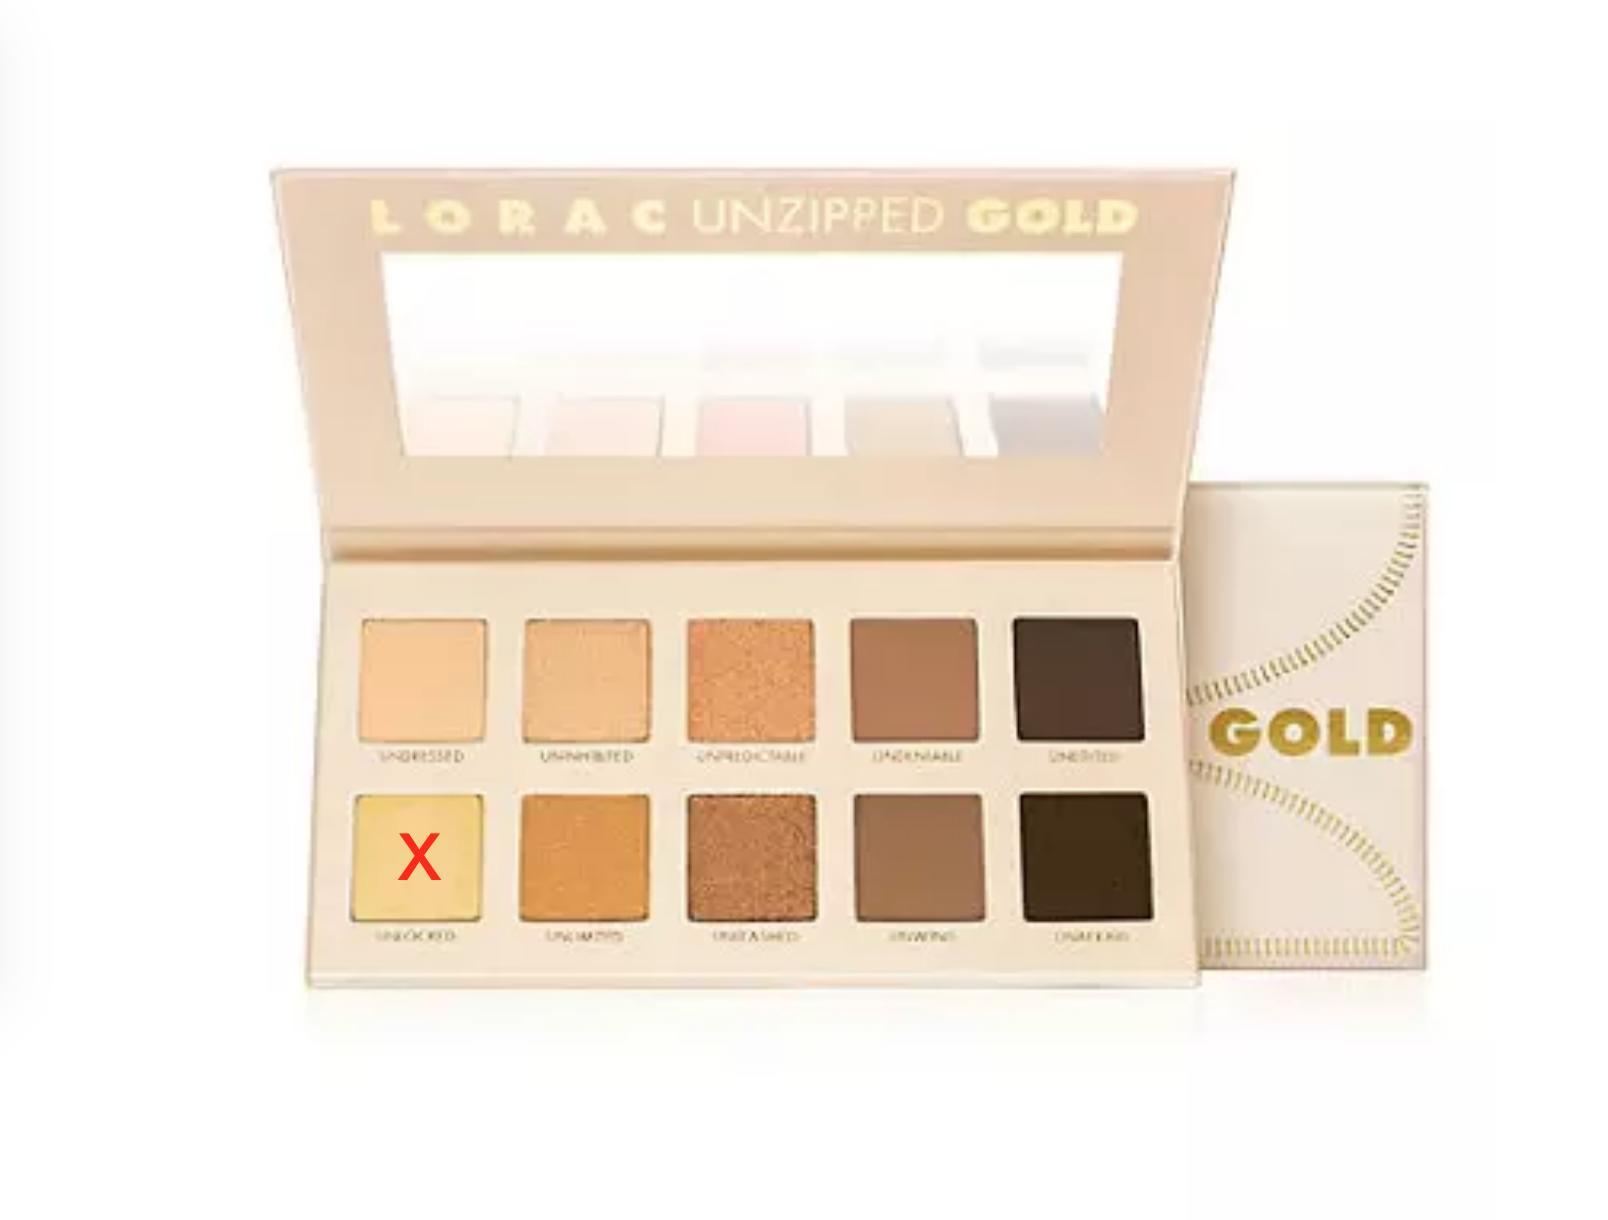 LORAC Unzipped Gold Palette (without unlocked)